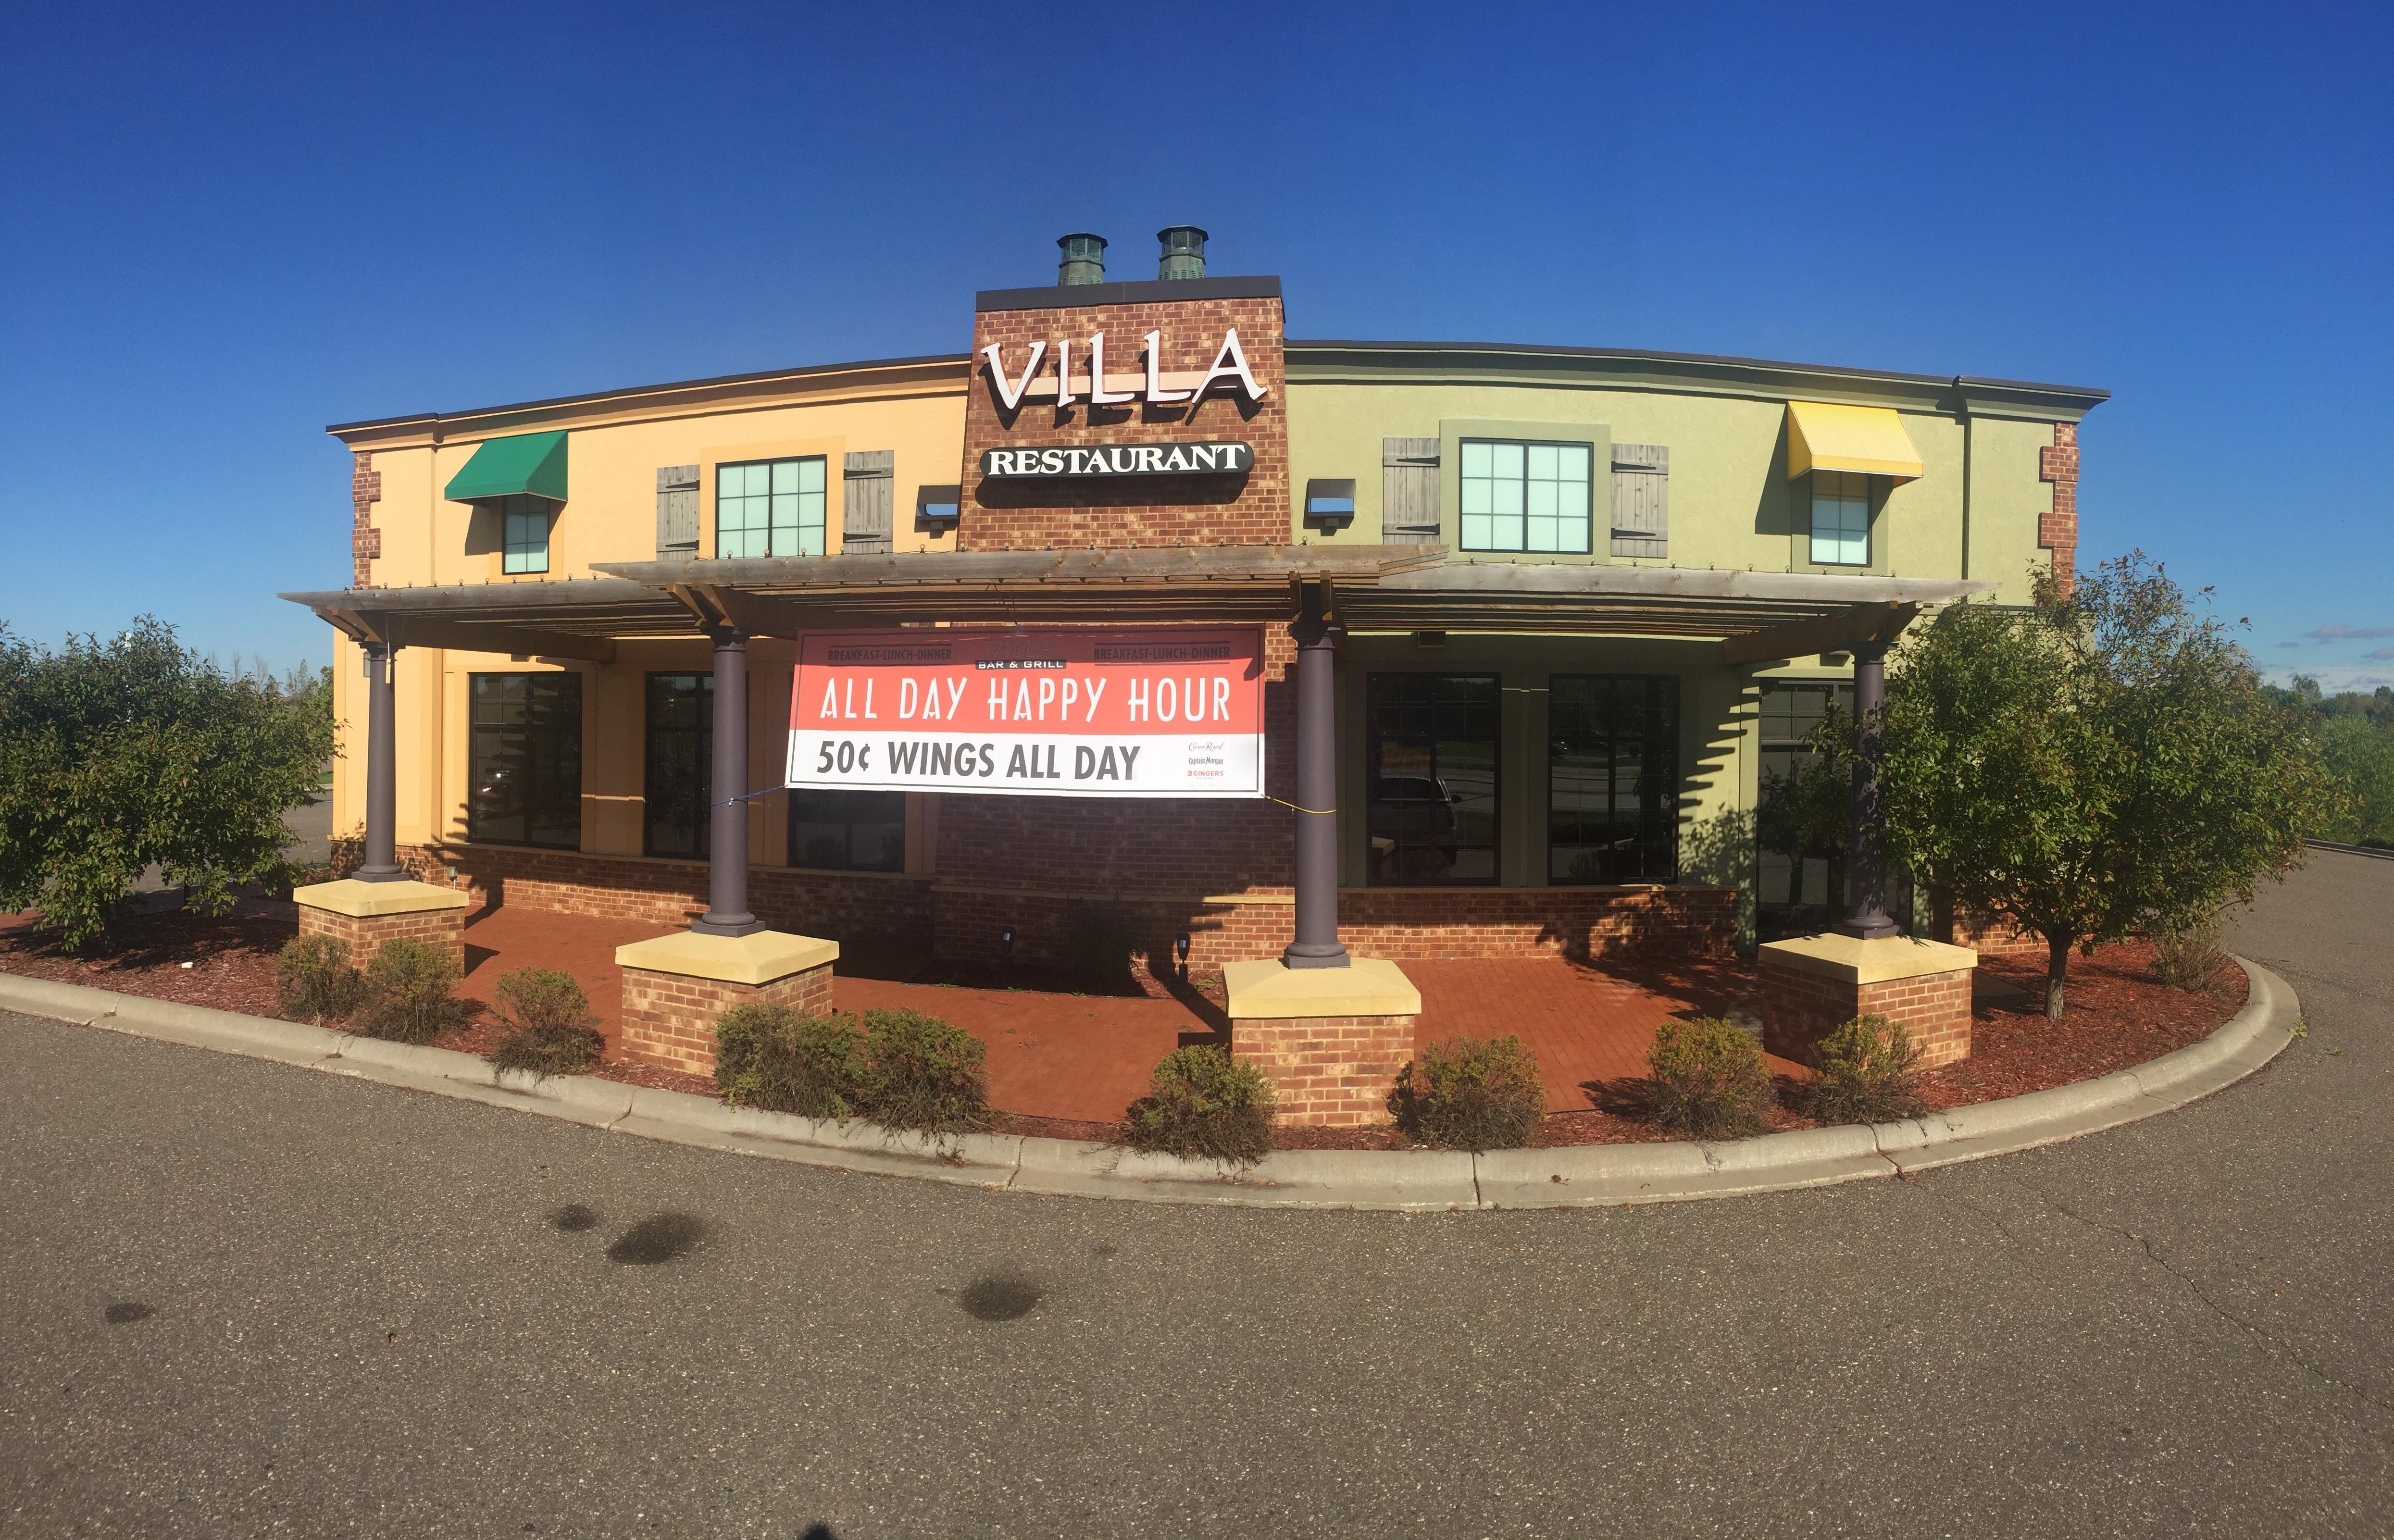 Family Restaurant in Albertville, MN | (763) 497-4399 Villa